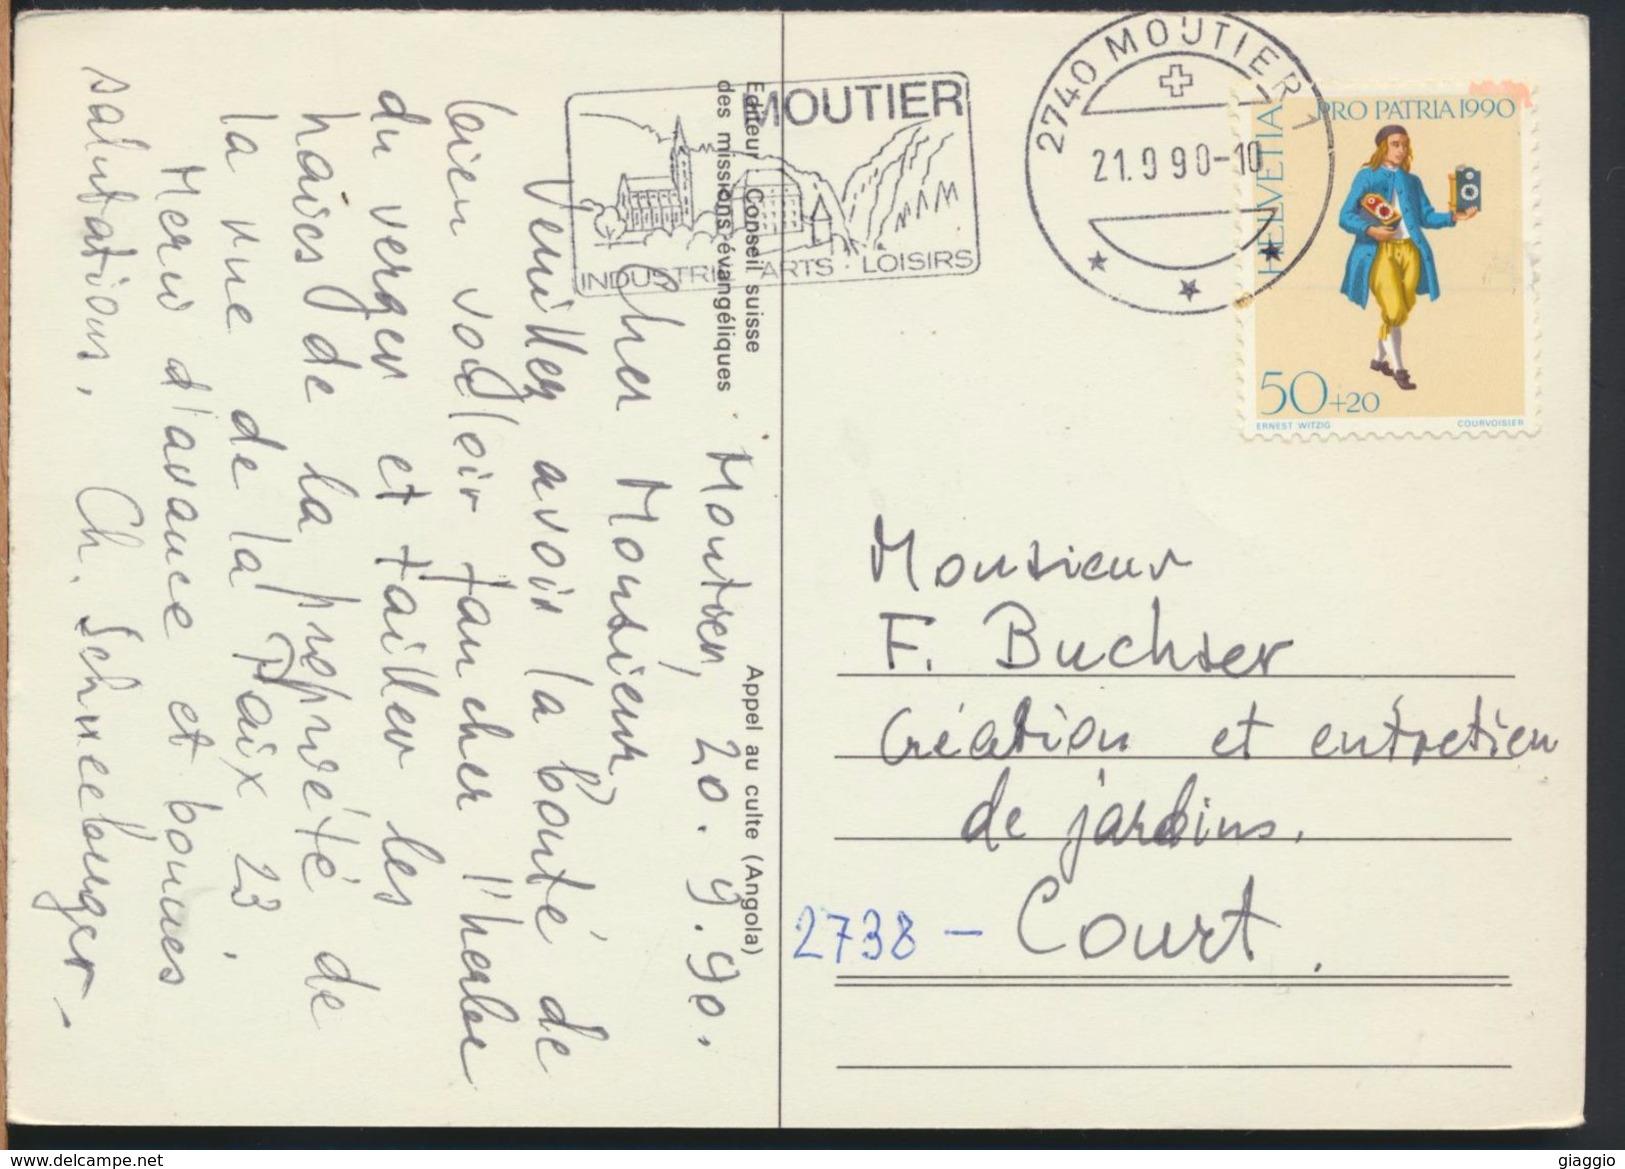 °°° 6798 - ANGOLA - APPEL AU CULTE - 1990 With Stamps Svizzera °°° - Angola